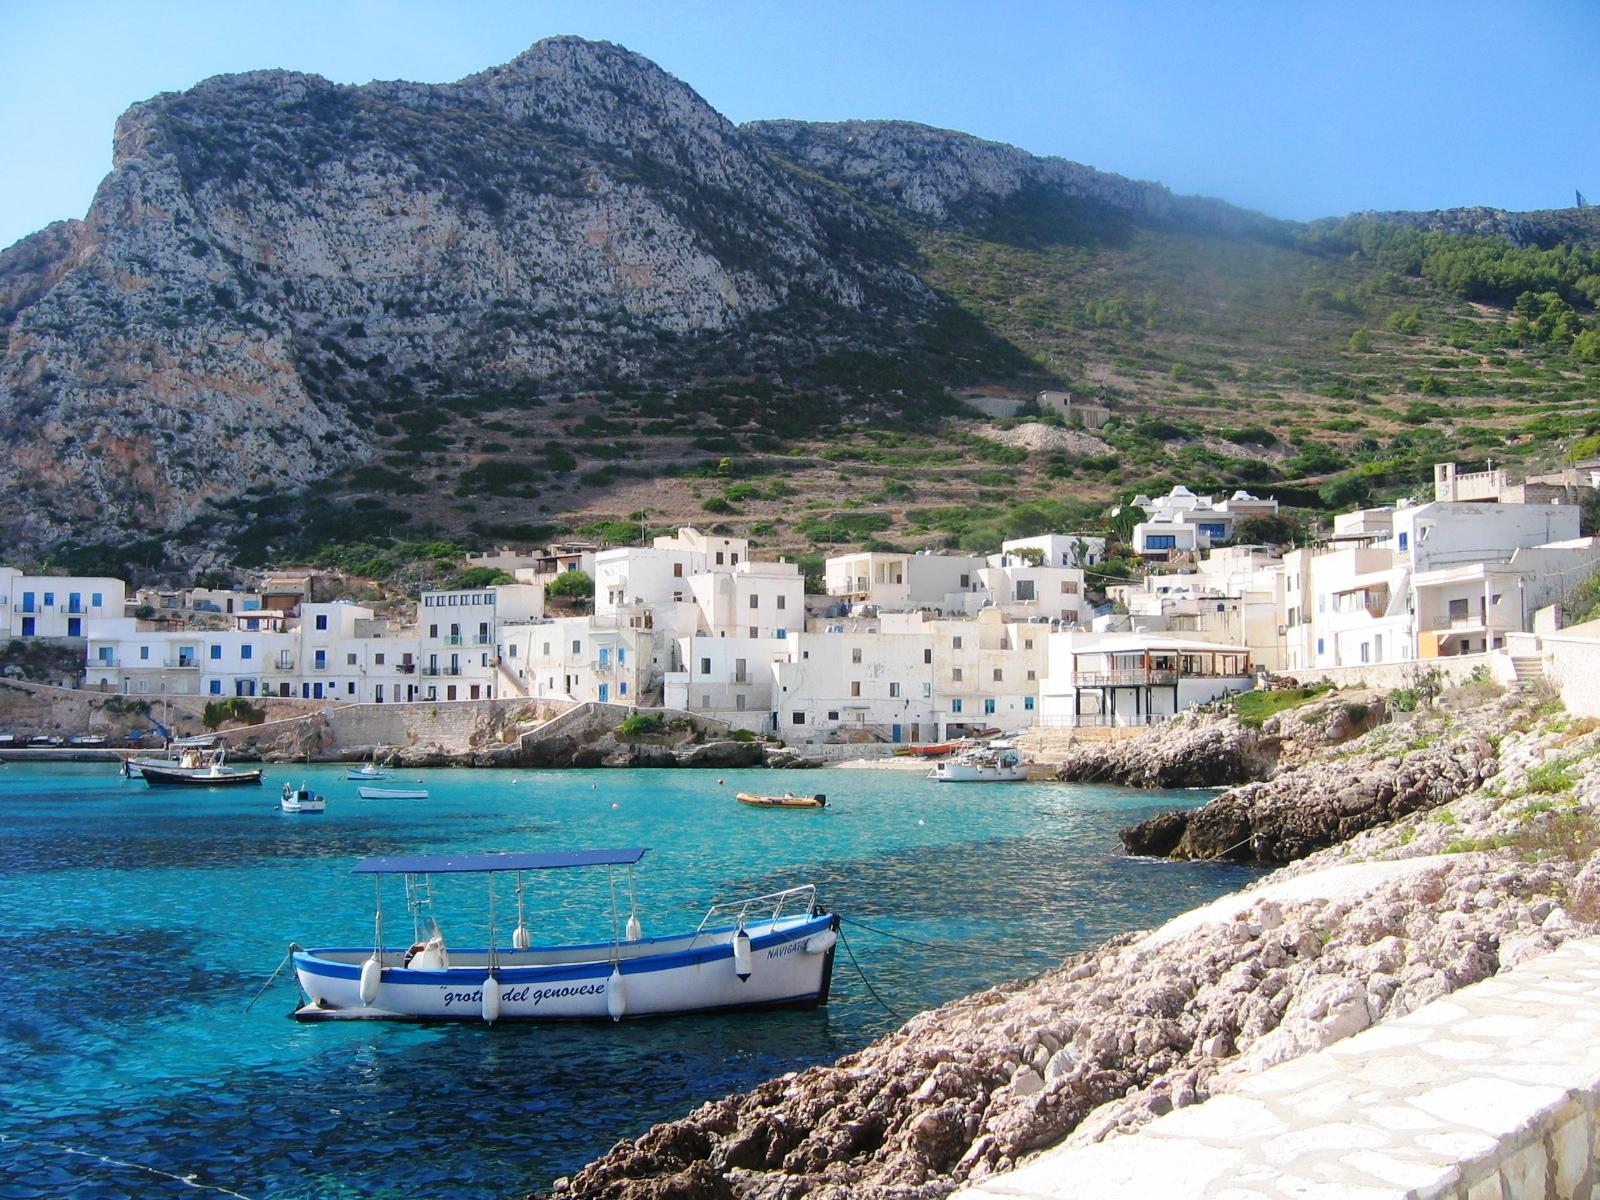 eilanden naast italie